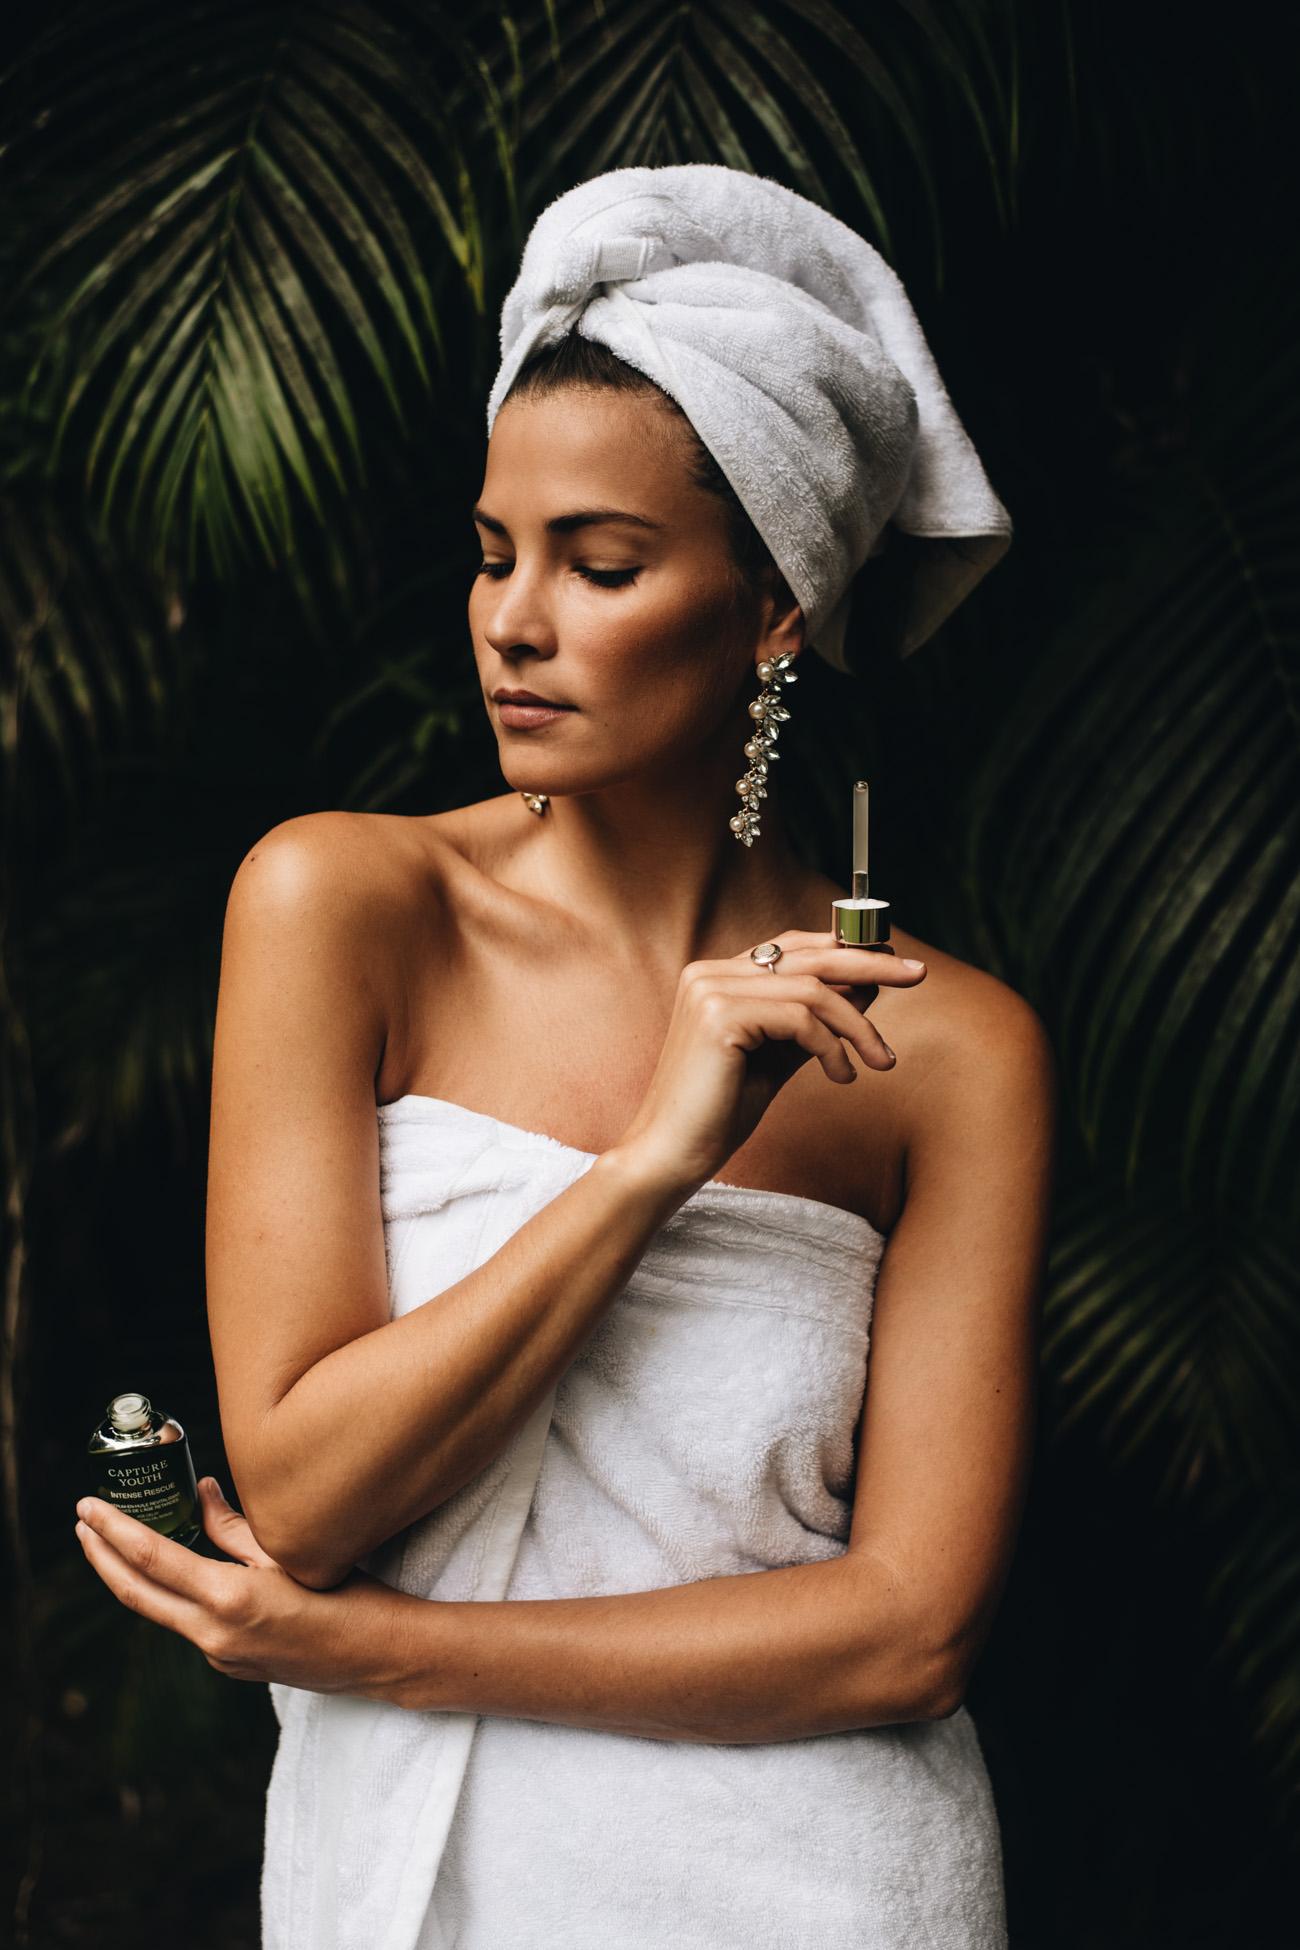 Dior Capture Youth Erfahrung